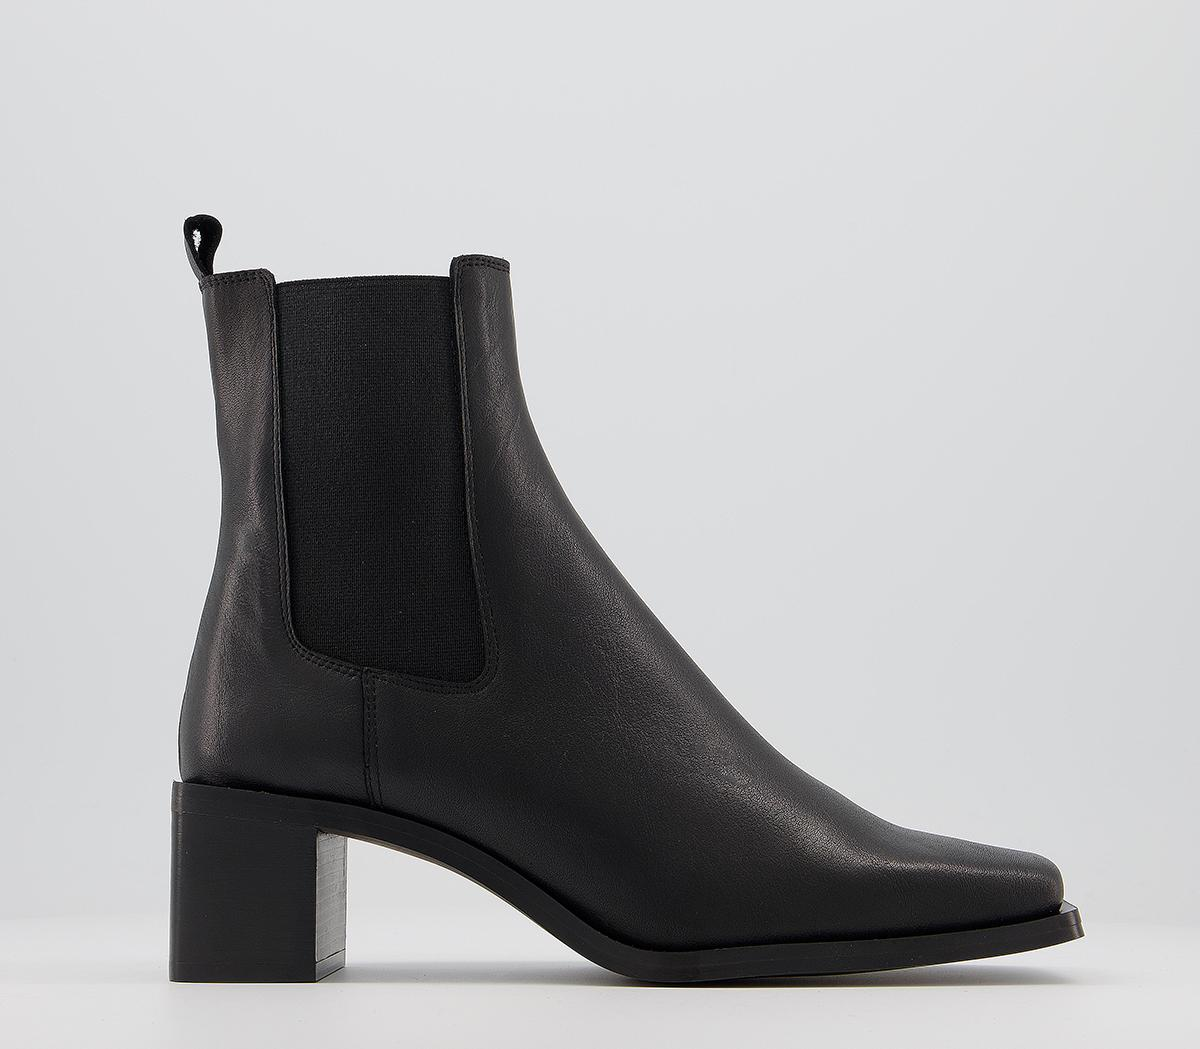 Appreciate Square Toe Block Heel Chelsea Boots